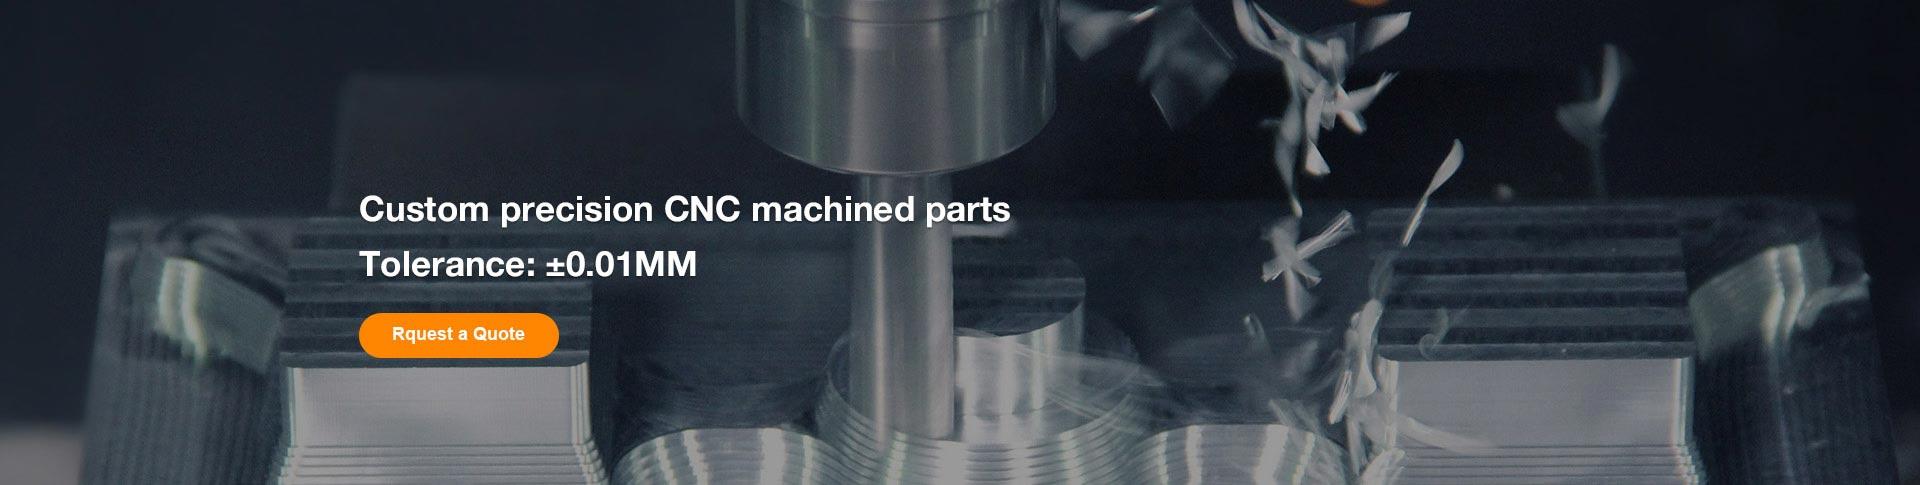 Custom precision CNC machined parts, Tolerance:±0.01MM